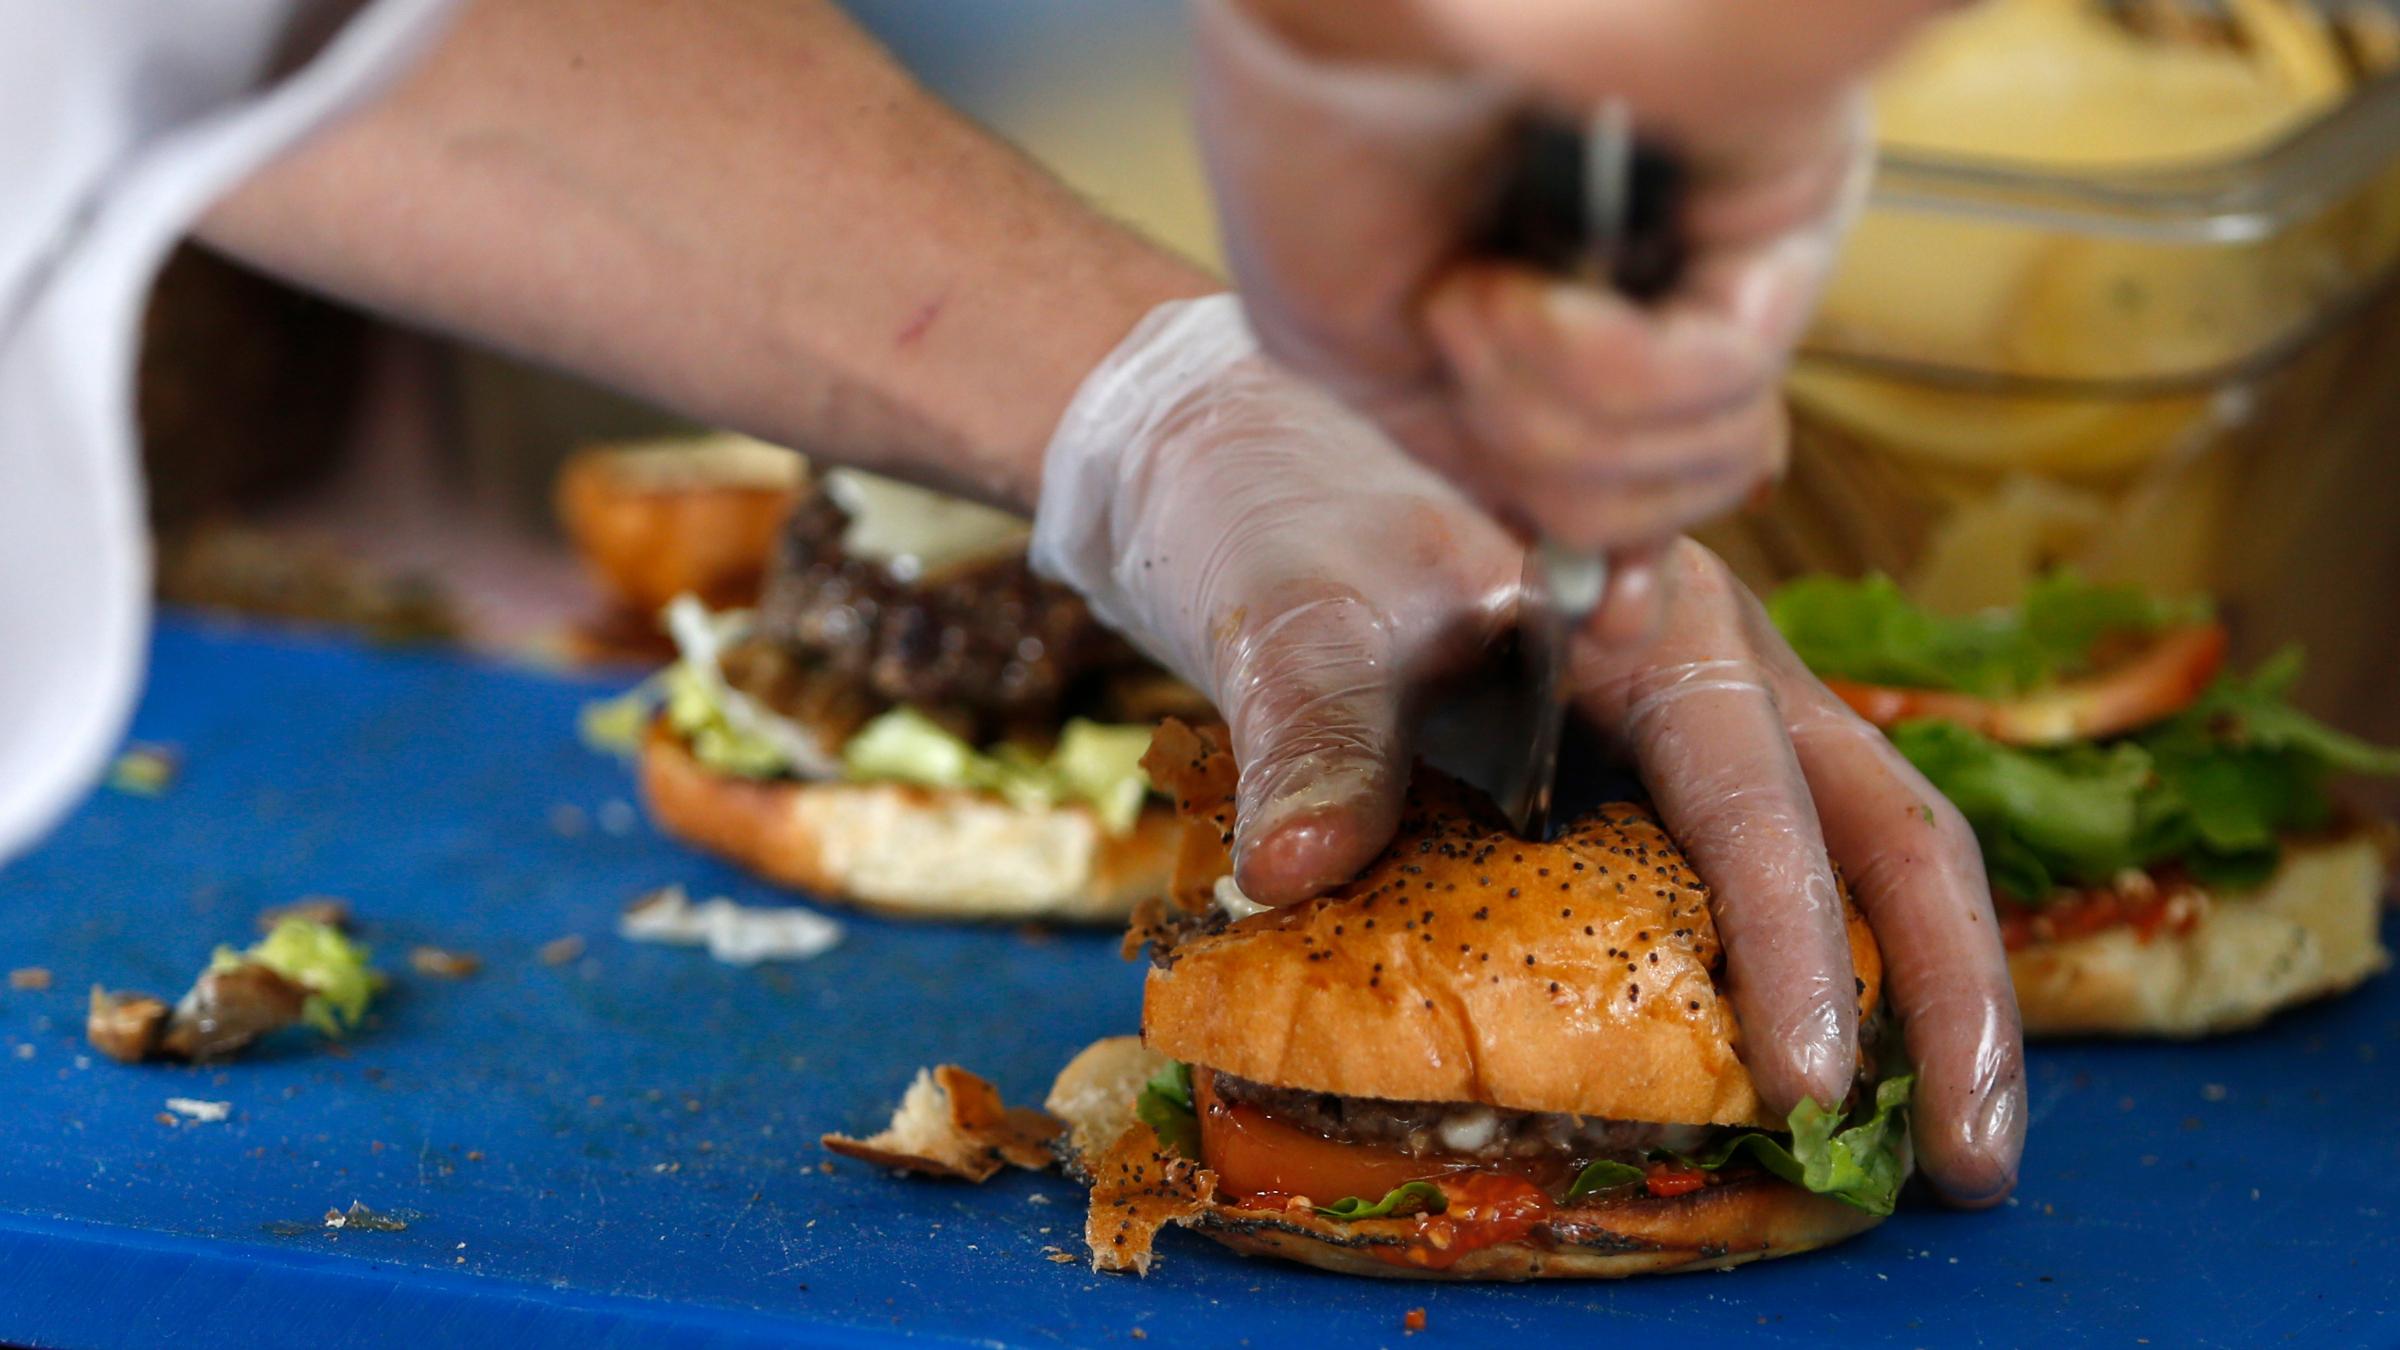 Hamburger France